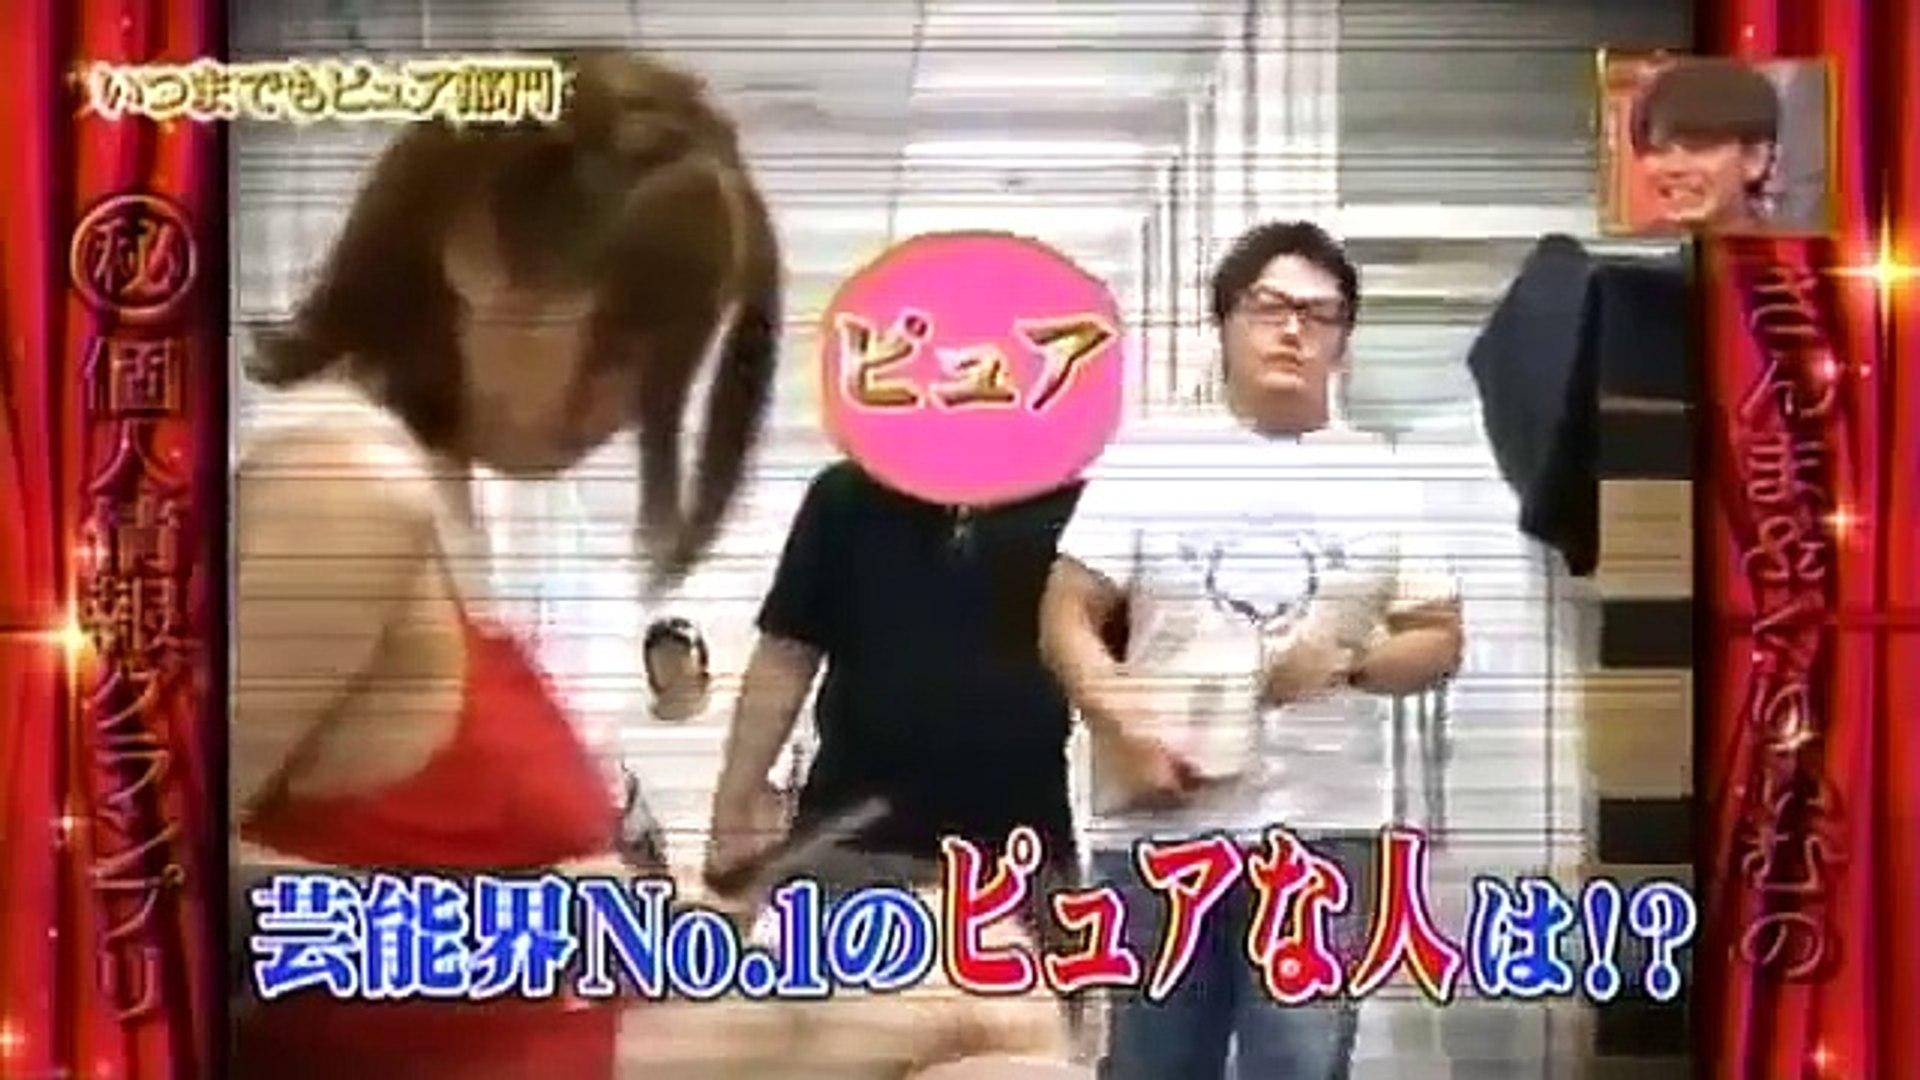 [JAPANESE 18+ SEXY PRANK]  GIRL WITH BIG BOOBS PRANK - Japanese sexy gameshows